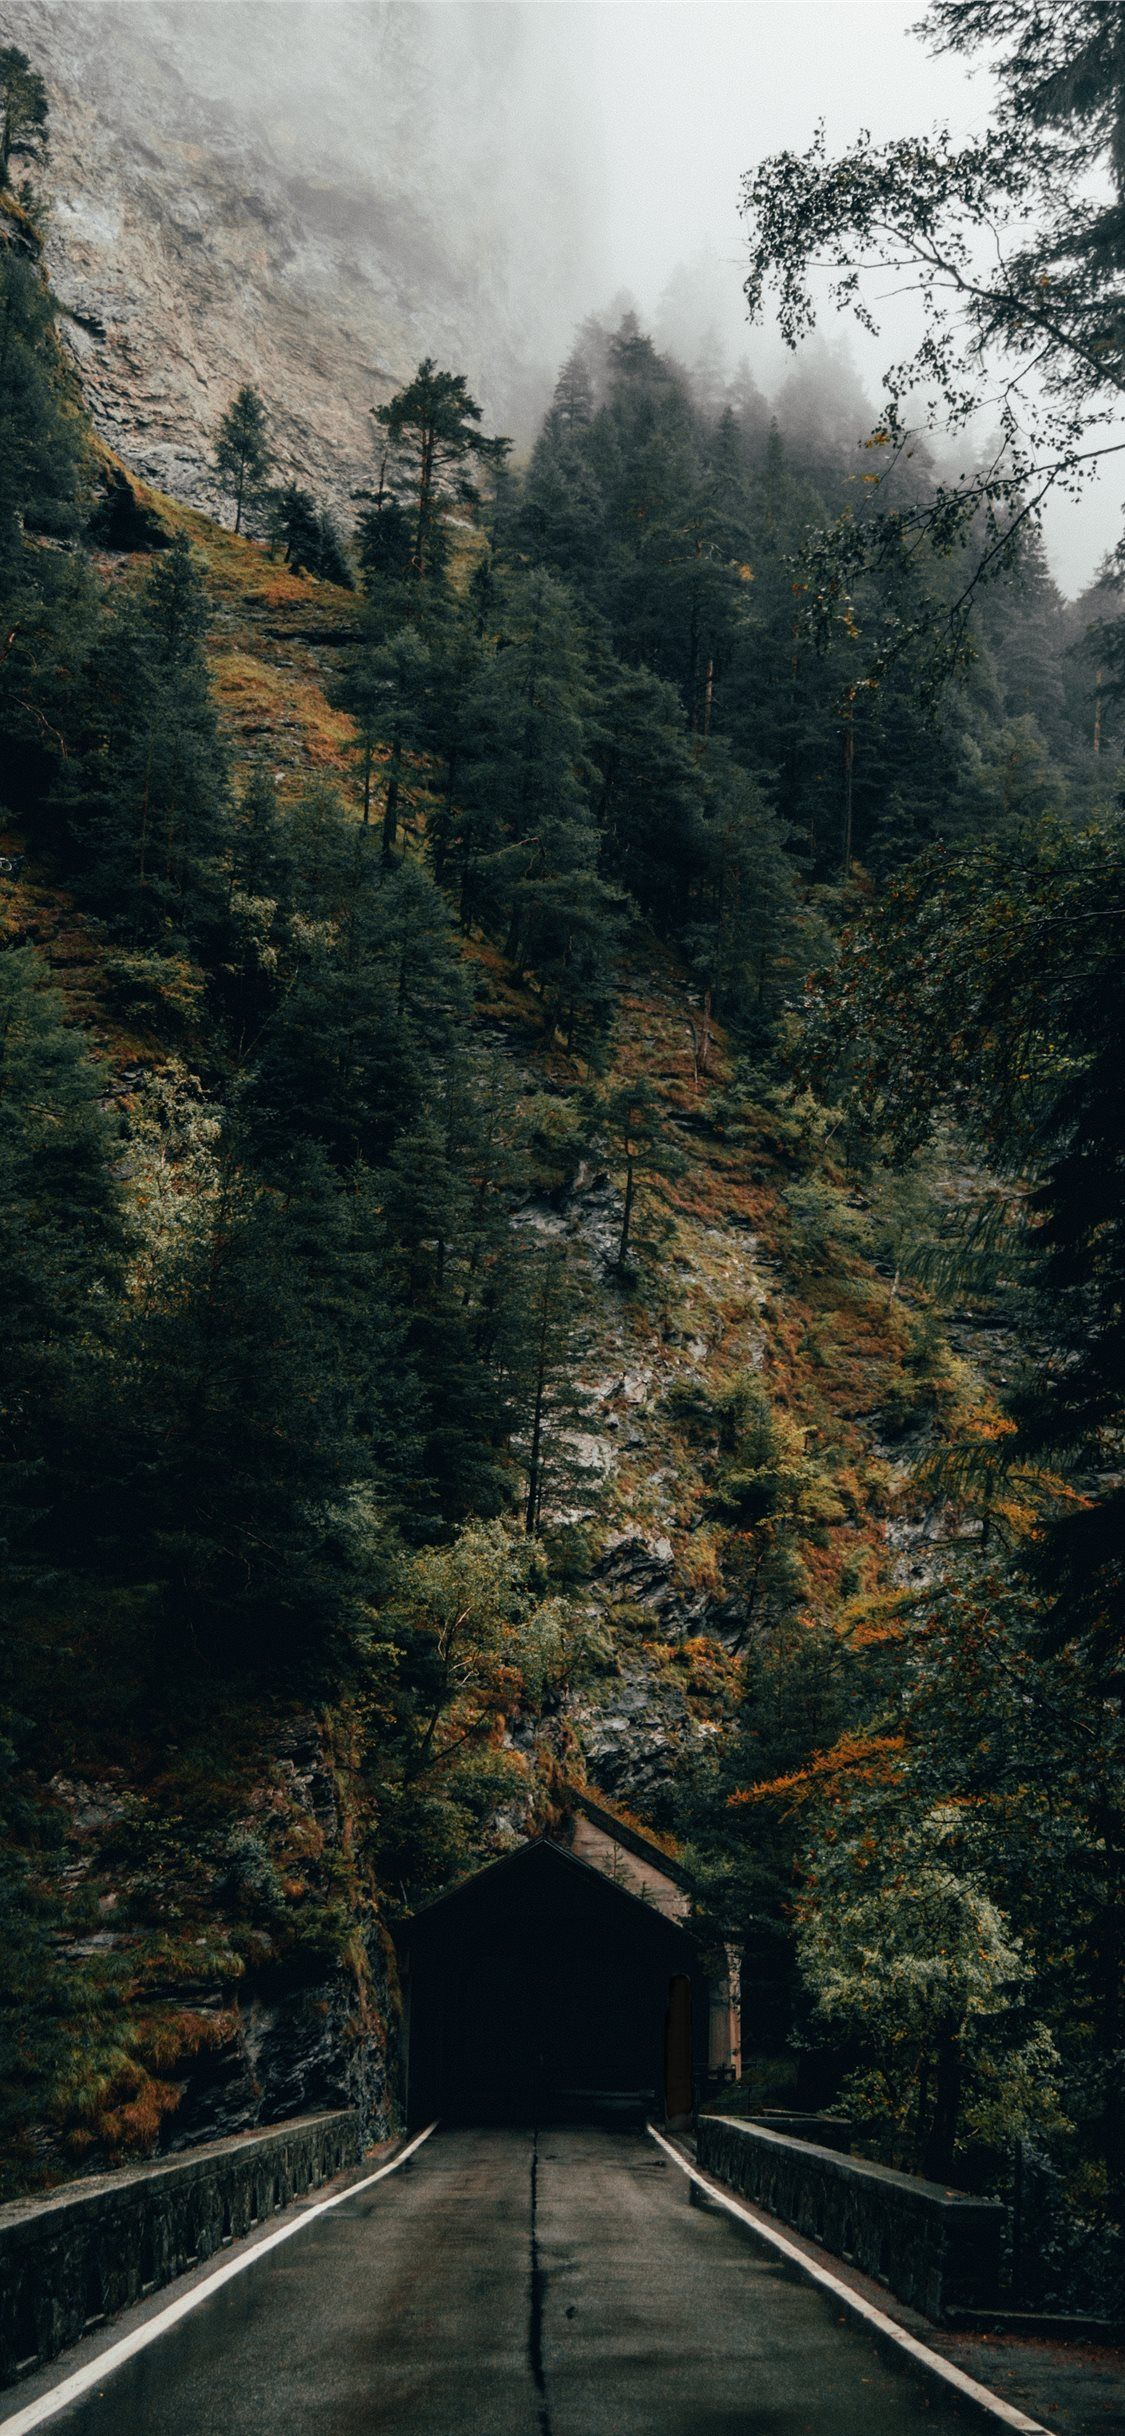 Iphone Xr Wallpaper Autumn Ipcwallpapers In 2020 Iphone Wallpaper Travel Autumn Forest Forest Wallpaper